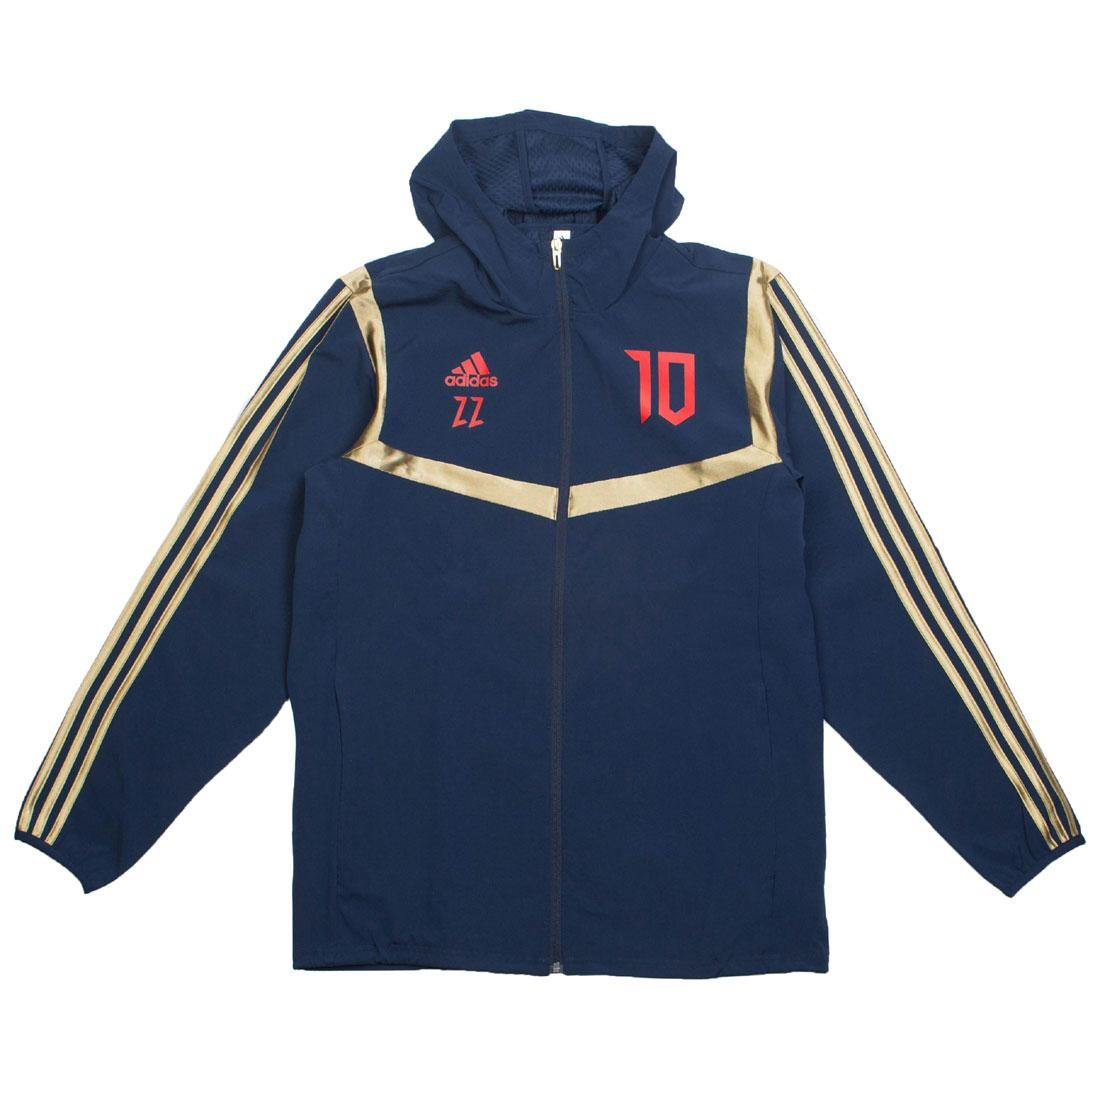 Adidas Men Predator Zinedine Zidane Hooded Jacket (navy / collegiate navy / red)